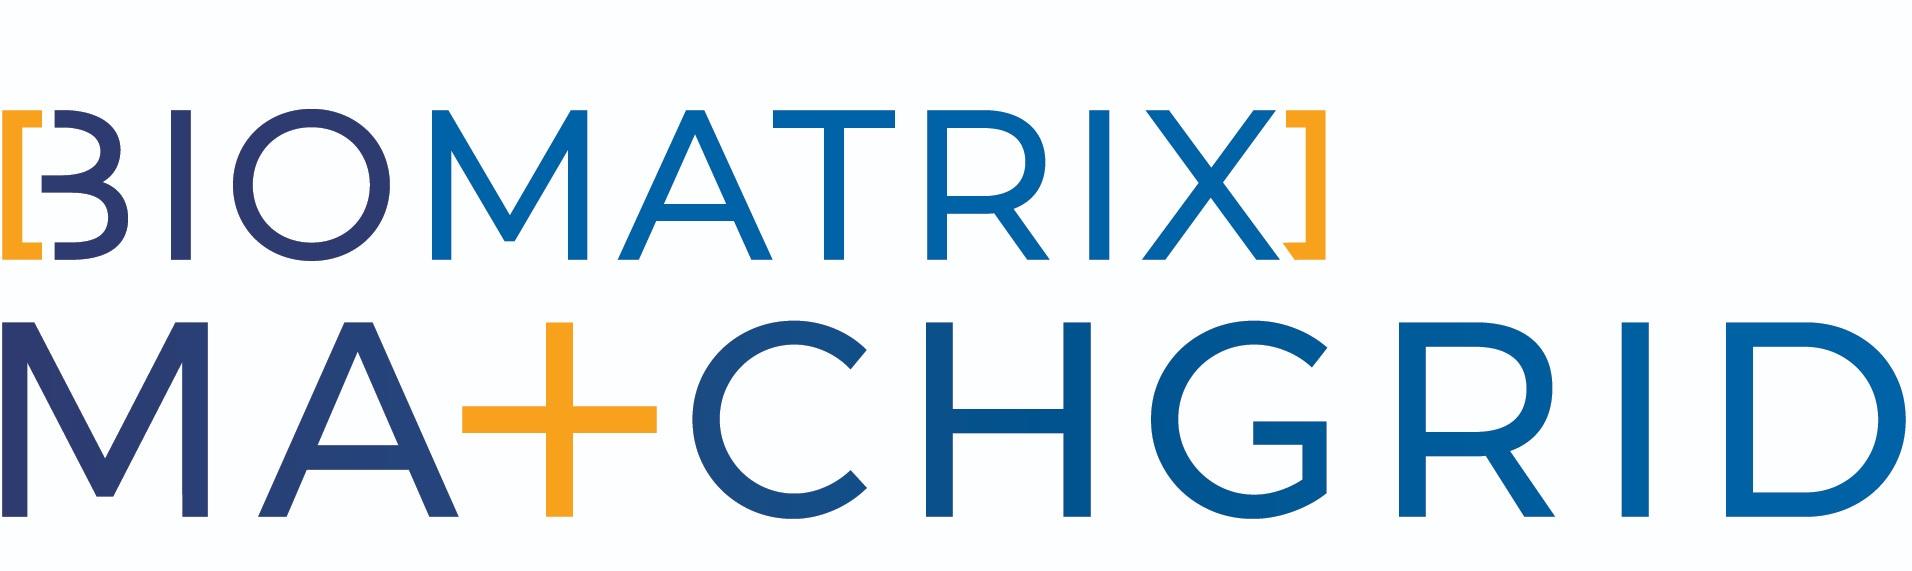 BioMatrix MatchGrid Branding